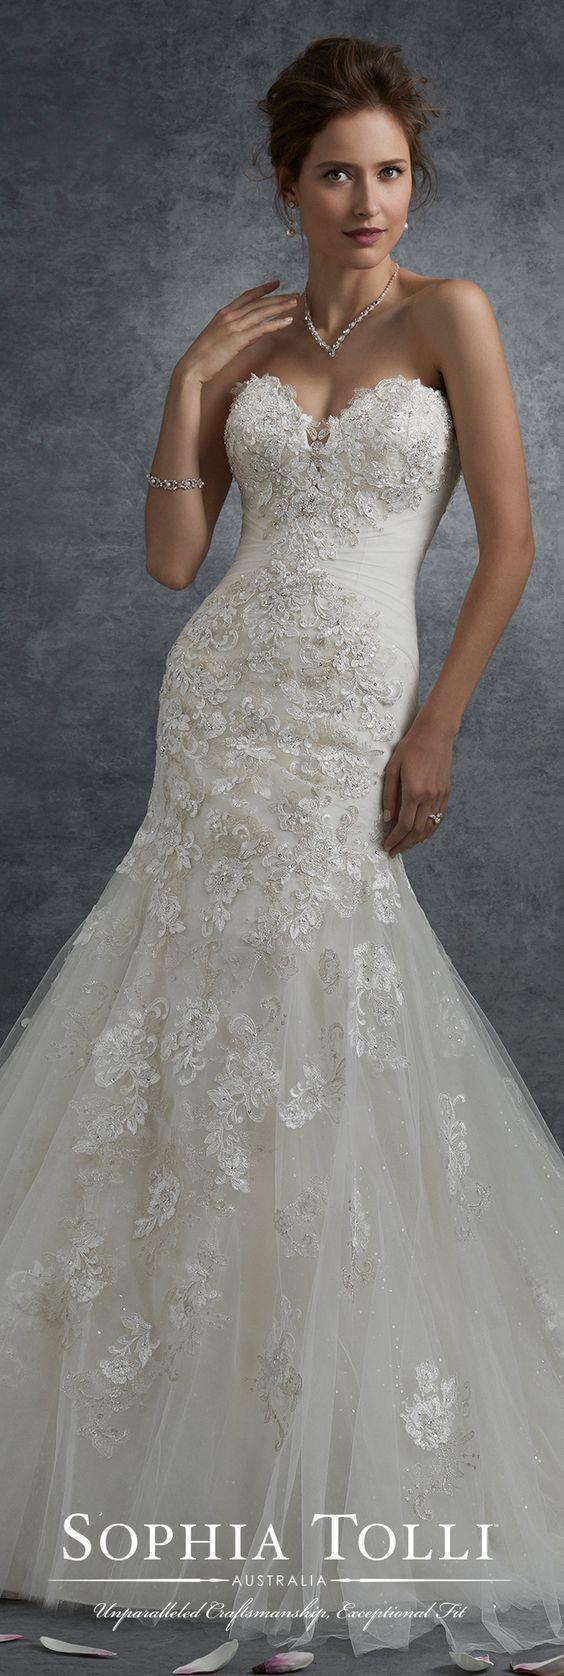 Wedding dress inspiration sophia tolli dress ideas wedding